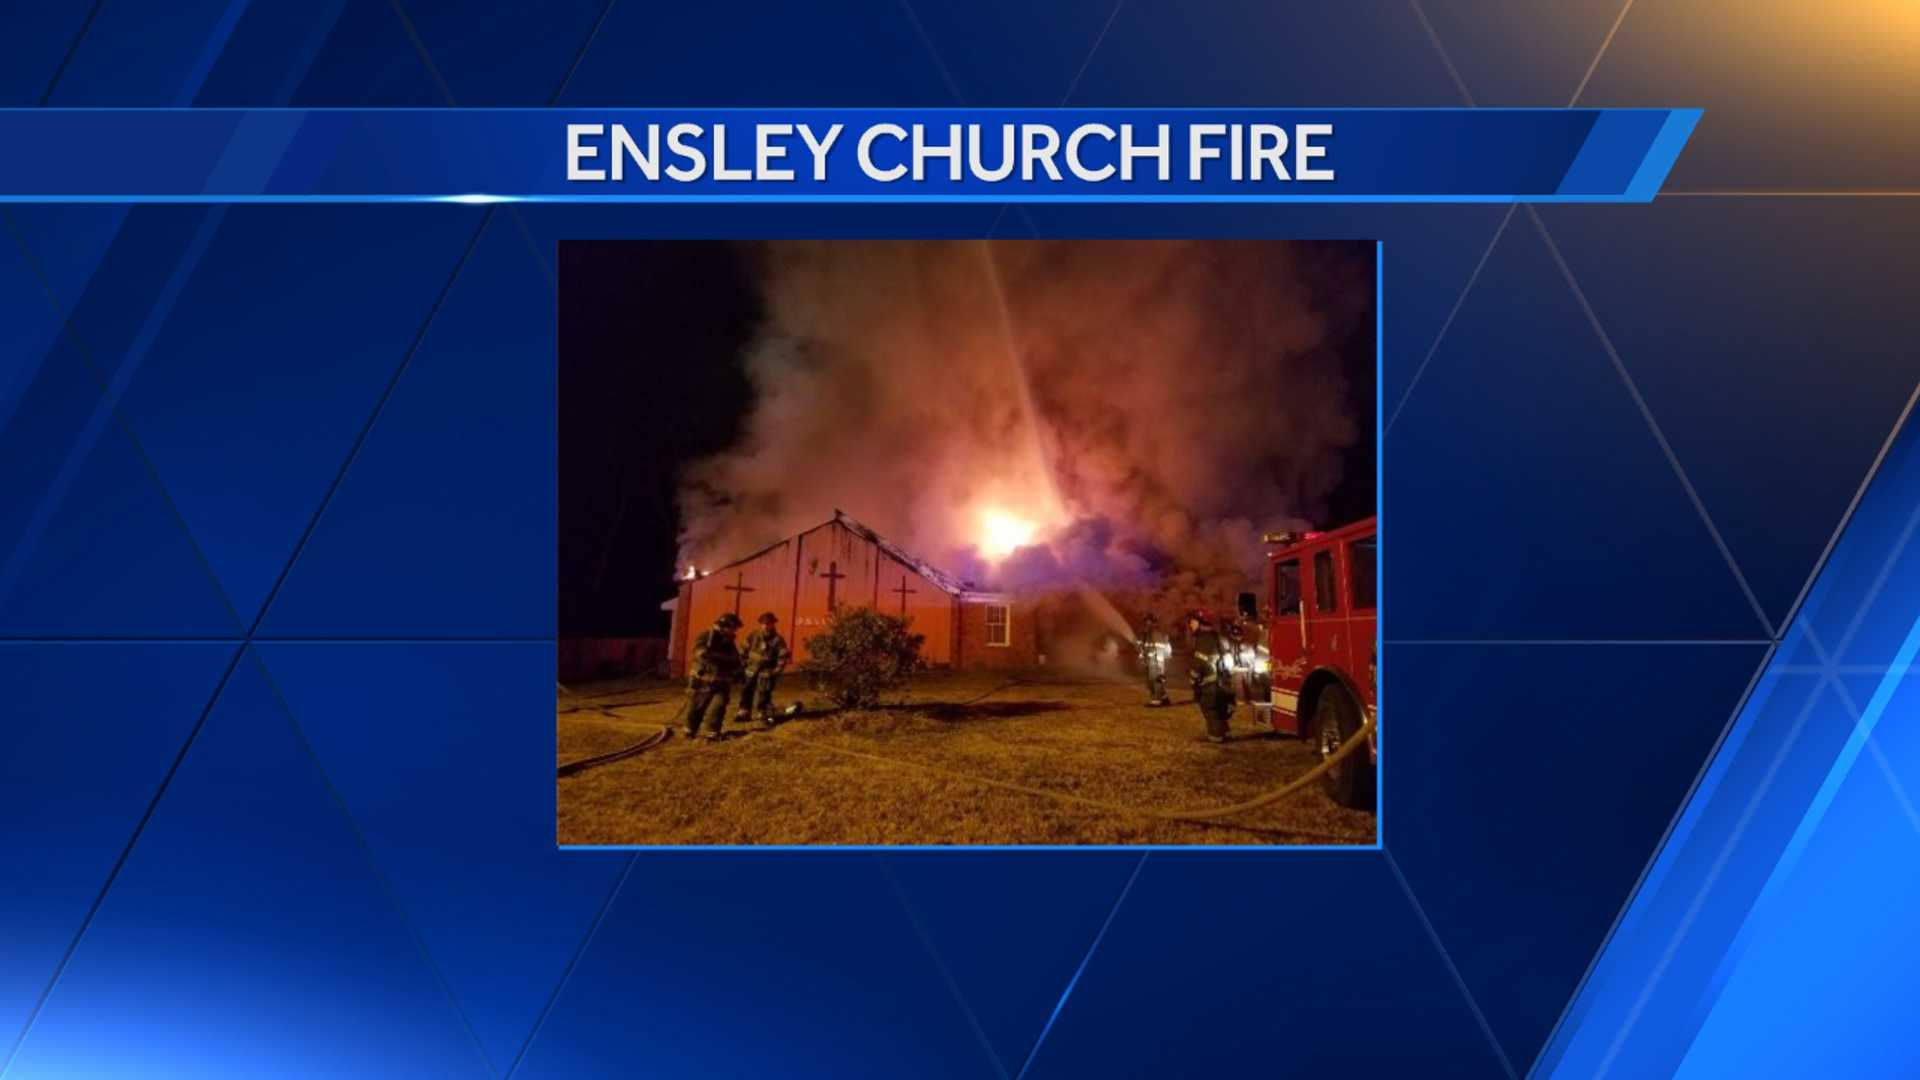 Ensley Church Fire